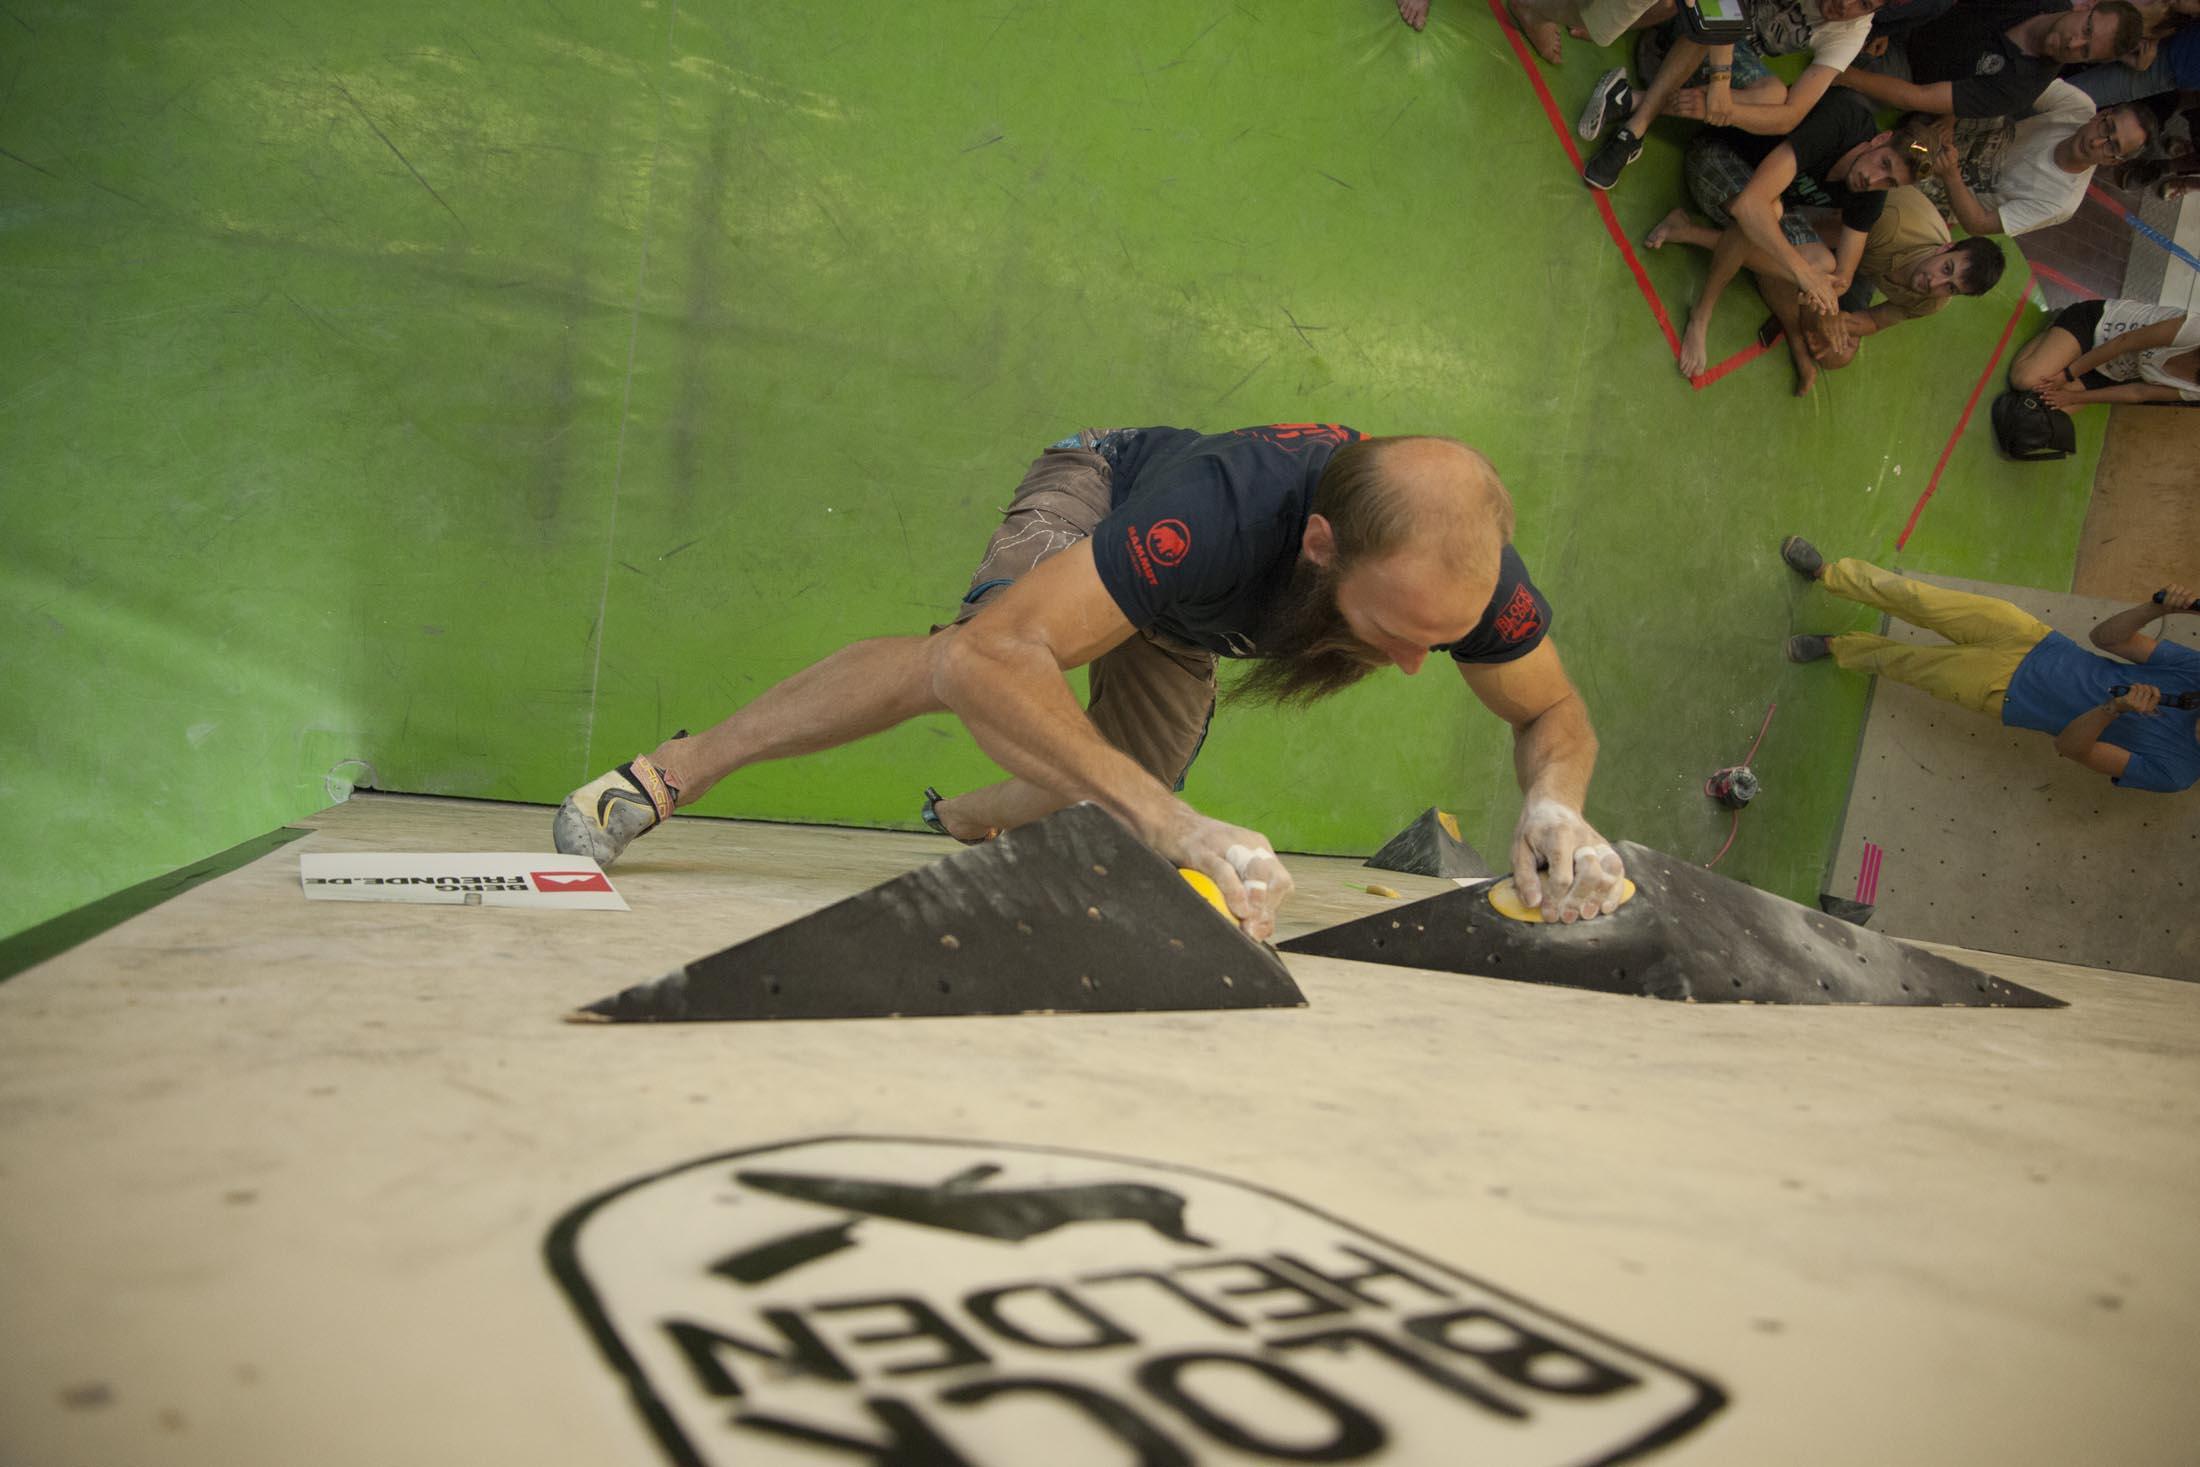 Finale, internationaler bouldercup Frankenjura 2016, BLOCKHELDEN Erlangen, Mammut, Bergfreunde.de, Boulderwettkampf07092016517